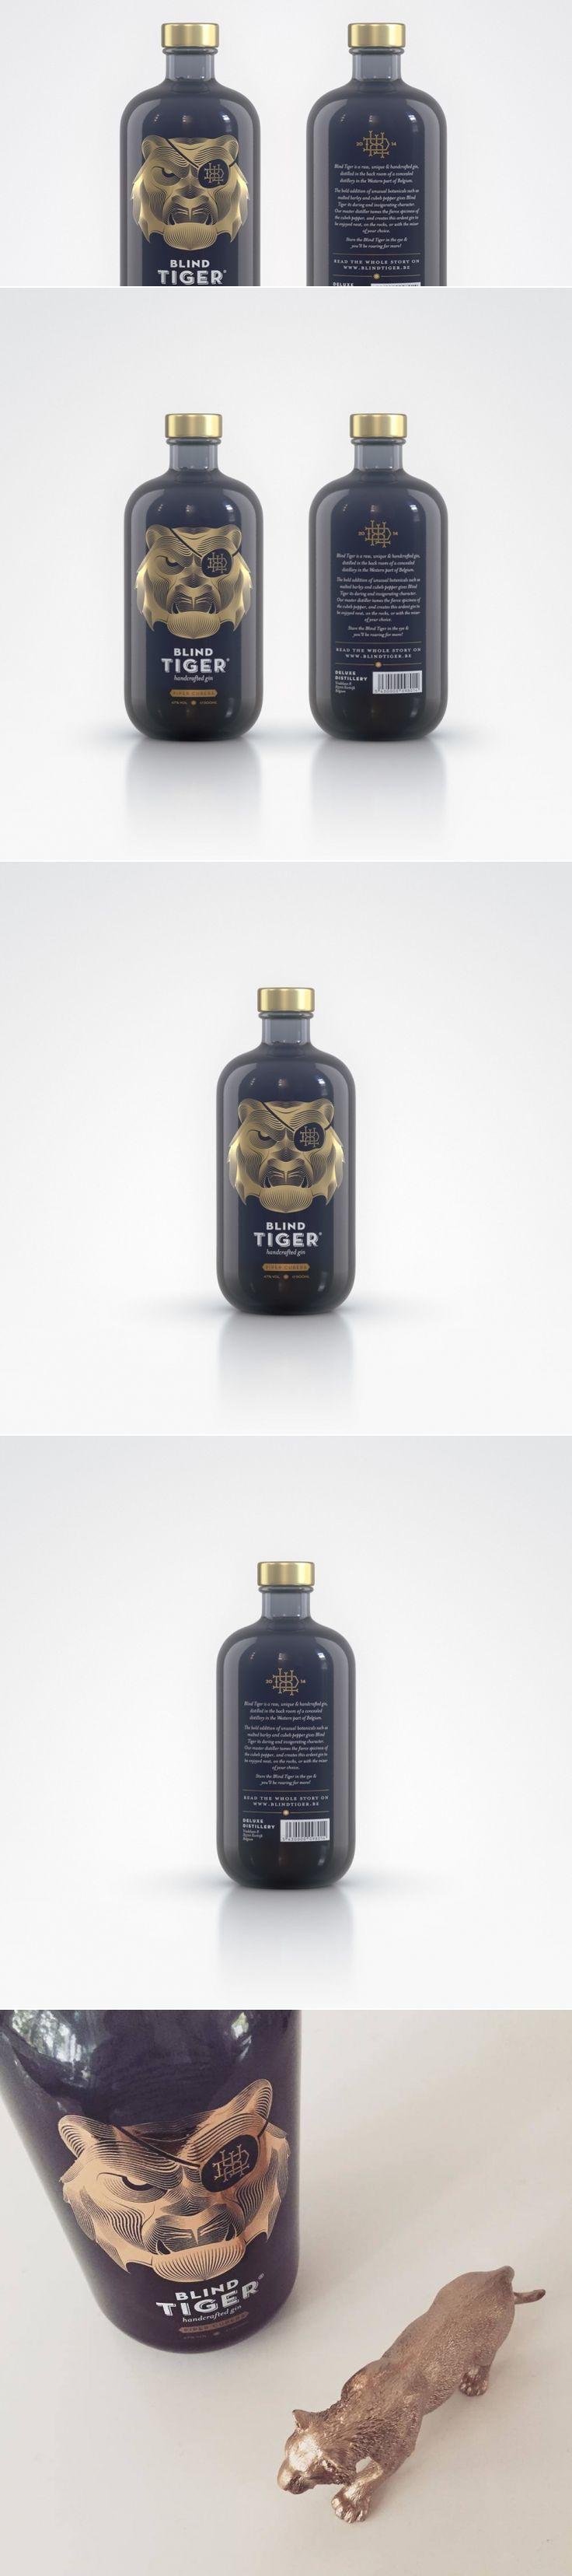 Blind Tiger Gin — The Dieline | Packaging & Branding Design & Innovation News